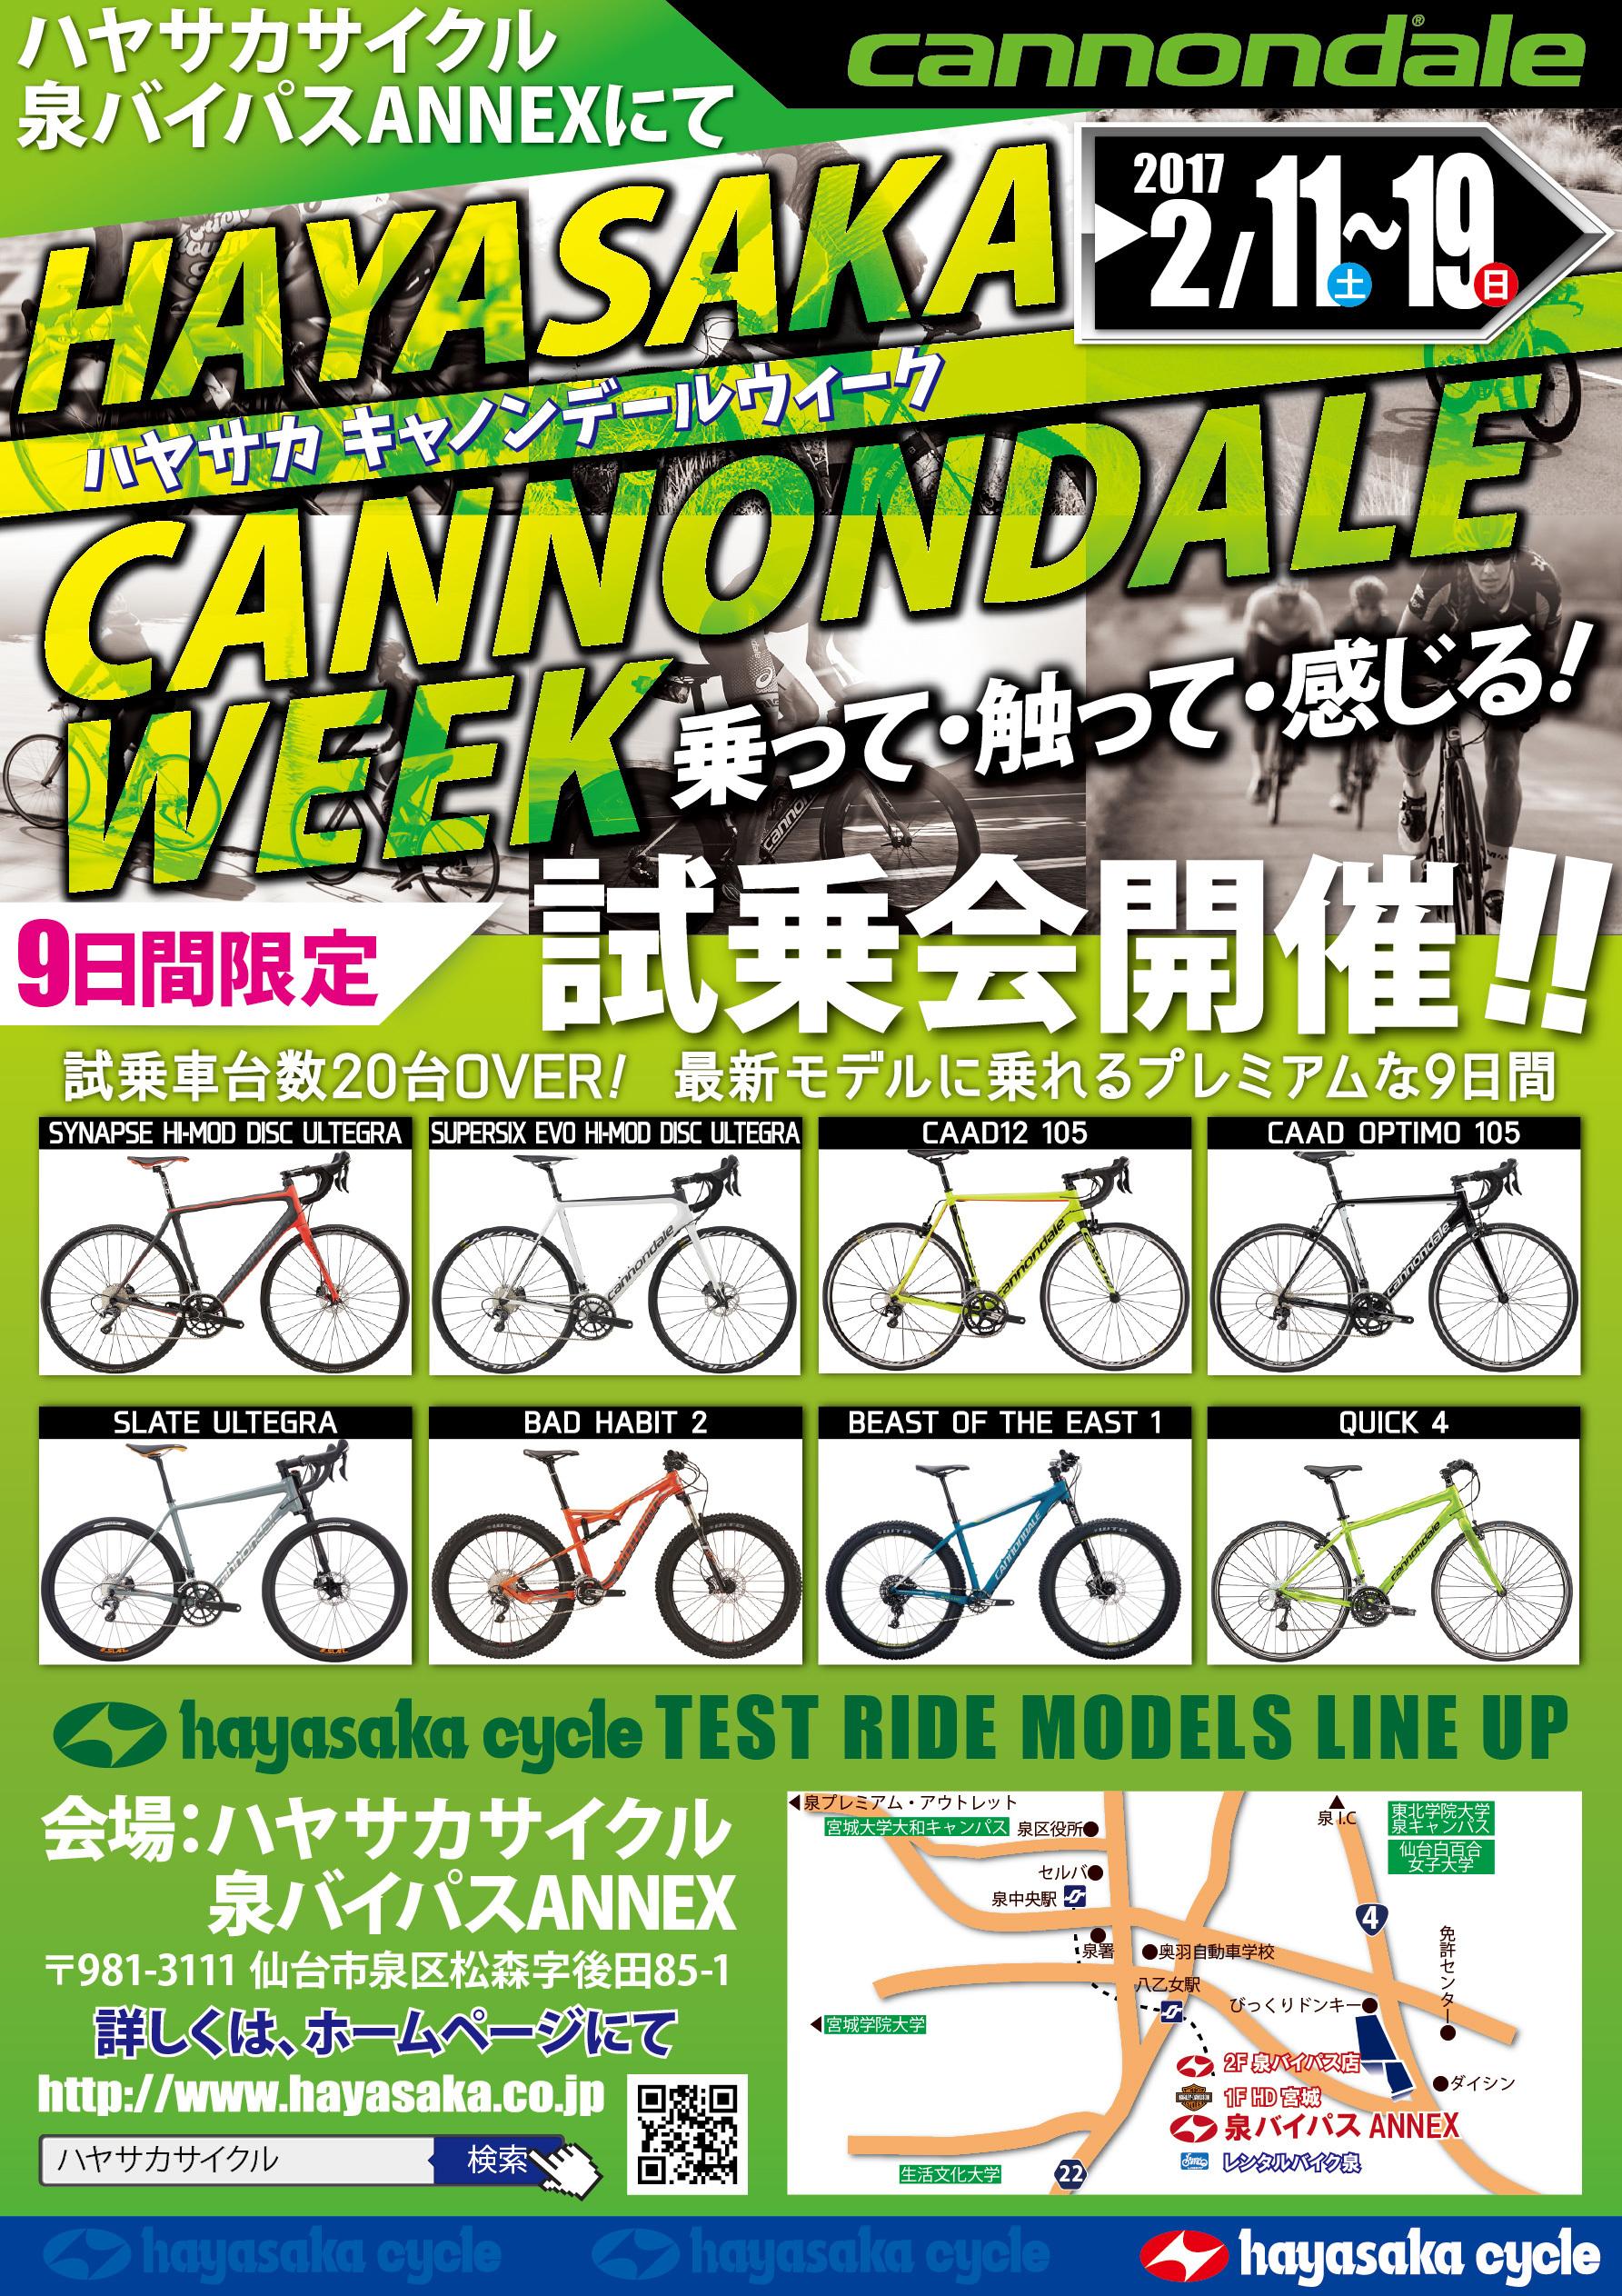 201602hayasaka-cannondale-week3.jpg